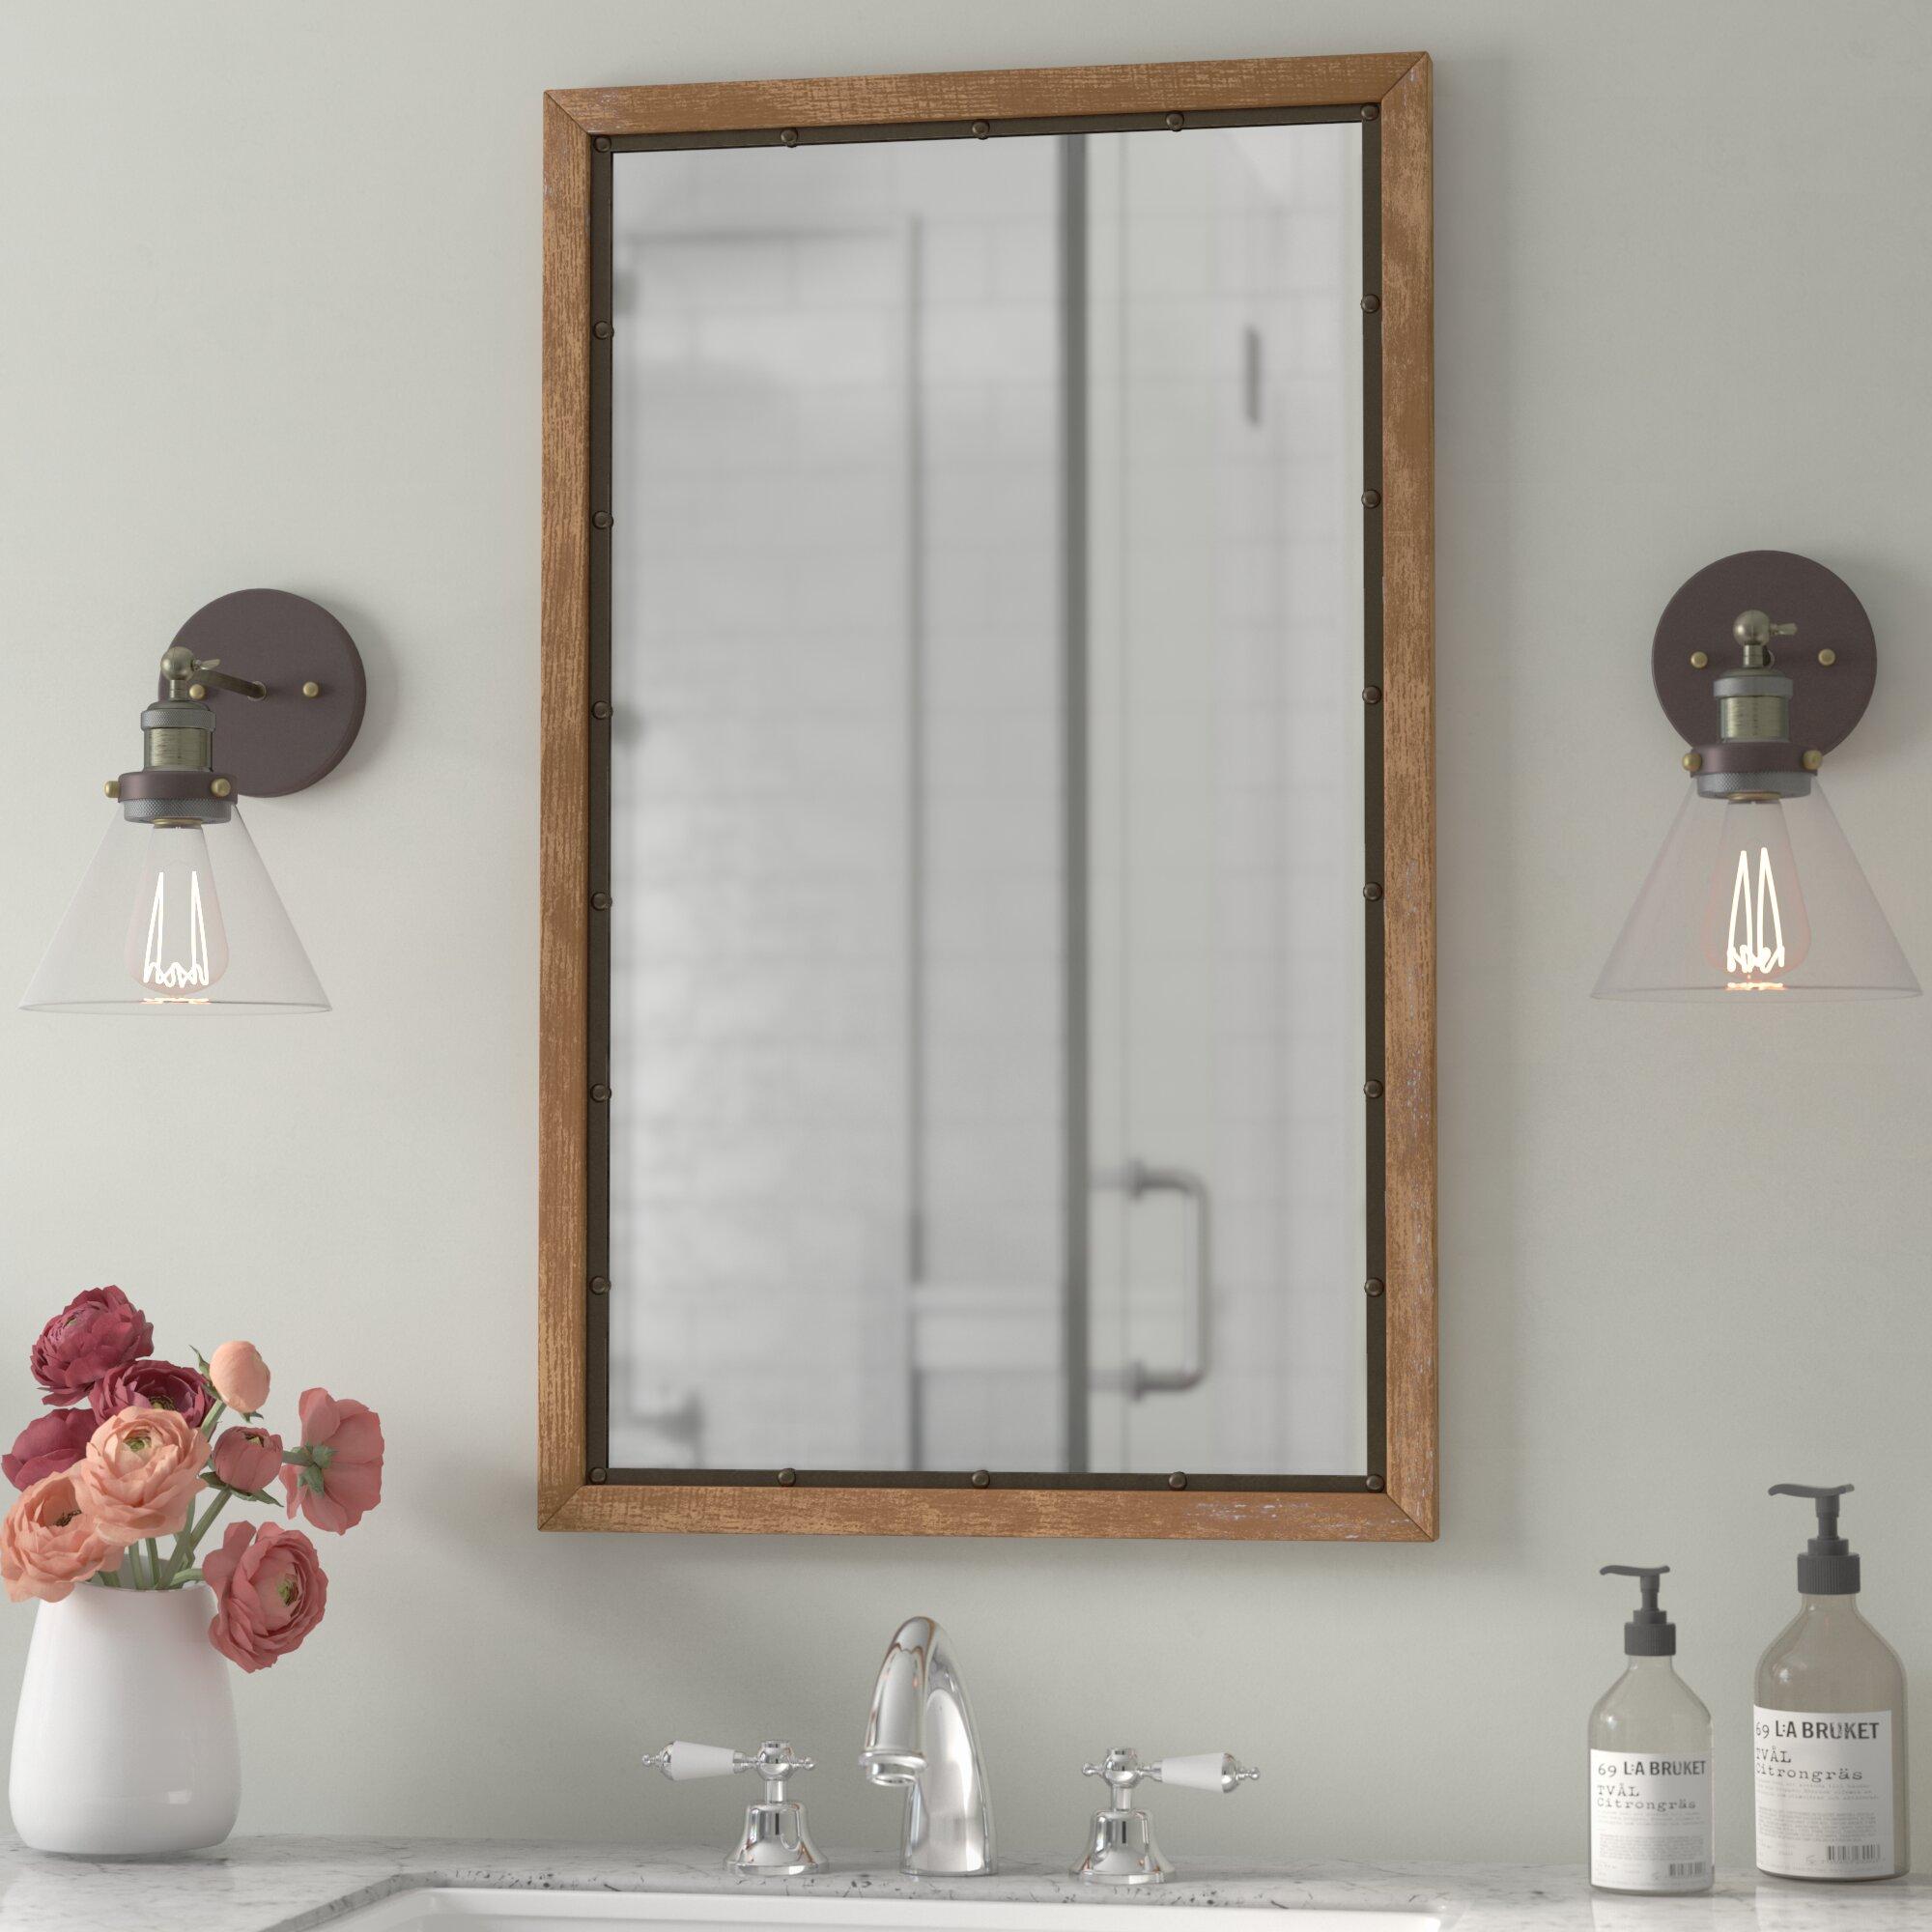 Gracie oaks verduzco rustic wood wall mirror reviews wayfair